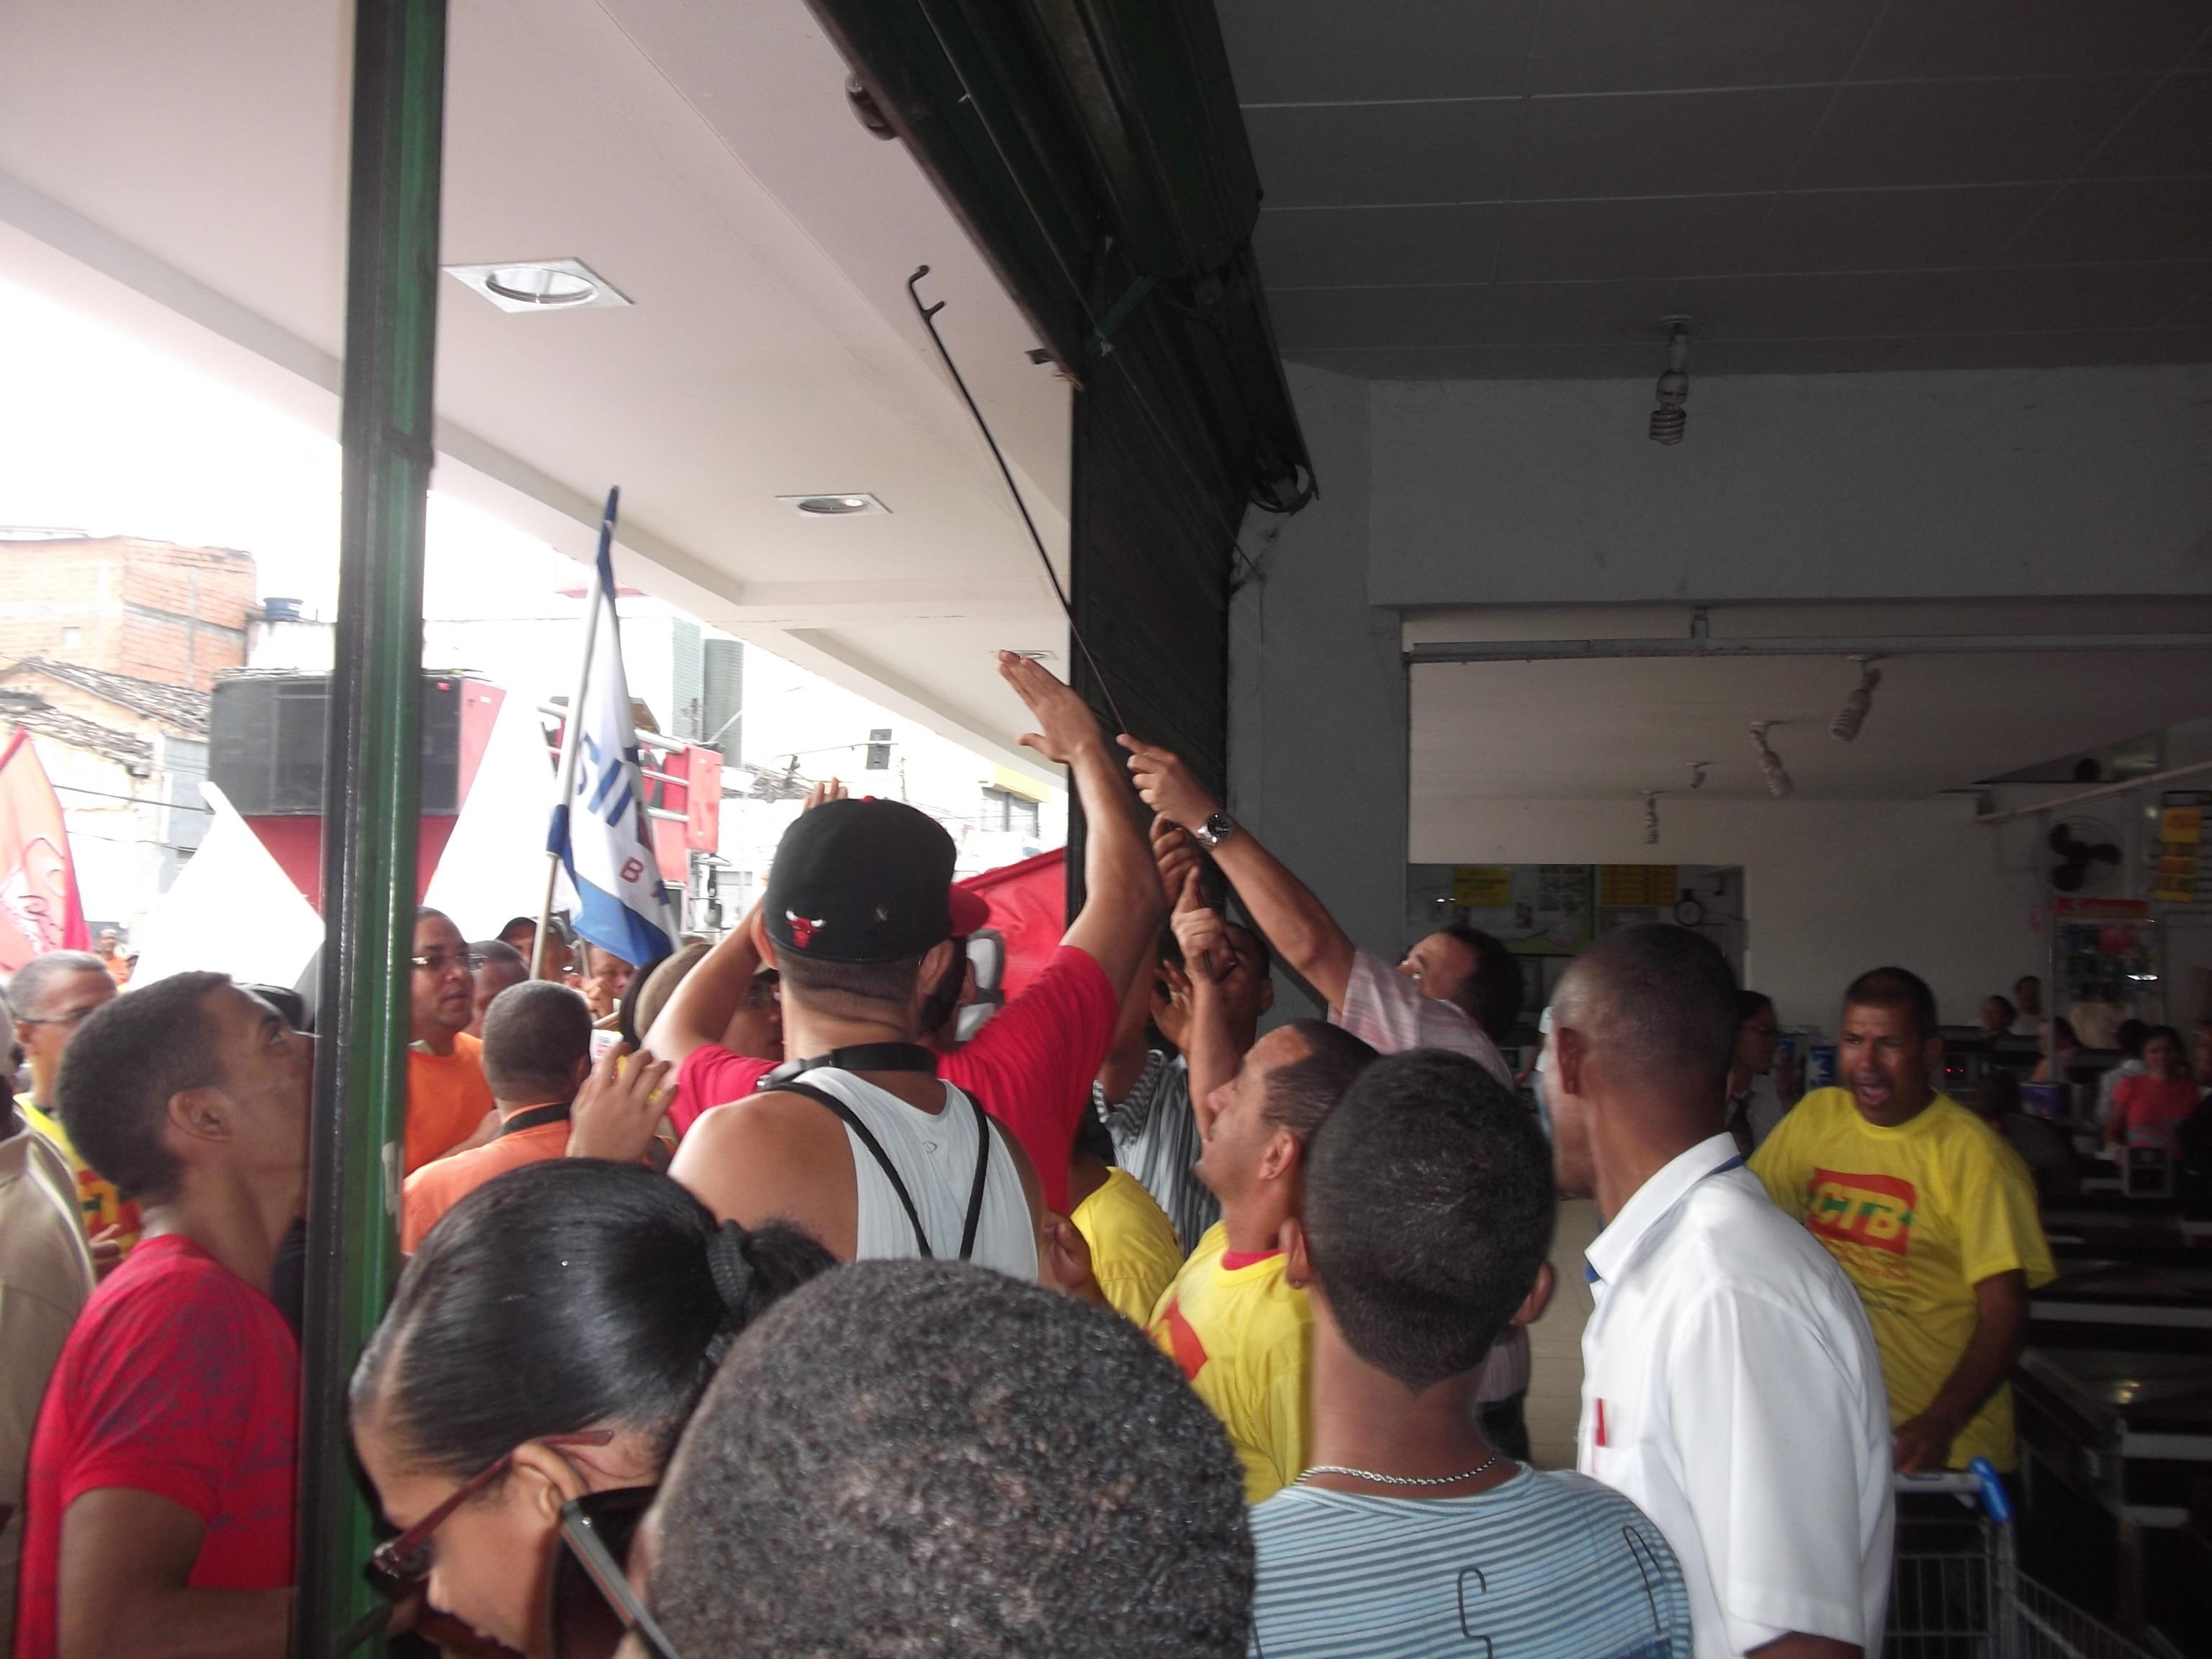 DIA NACIONAL DE LUTA 8